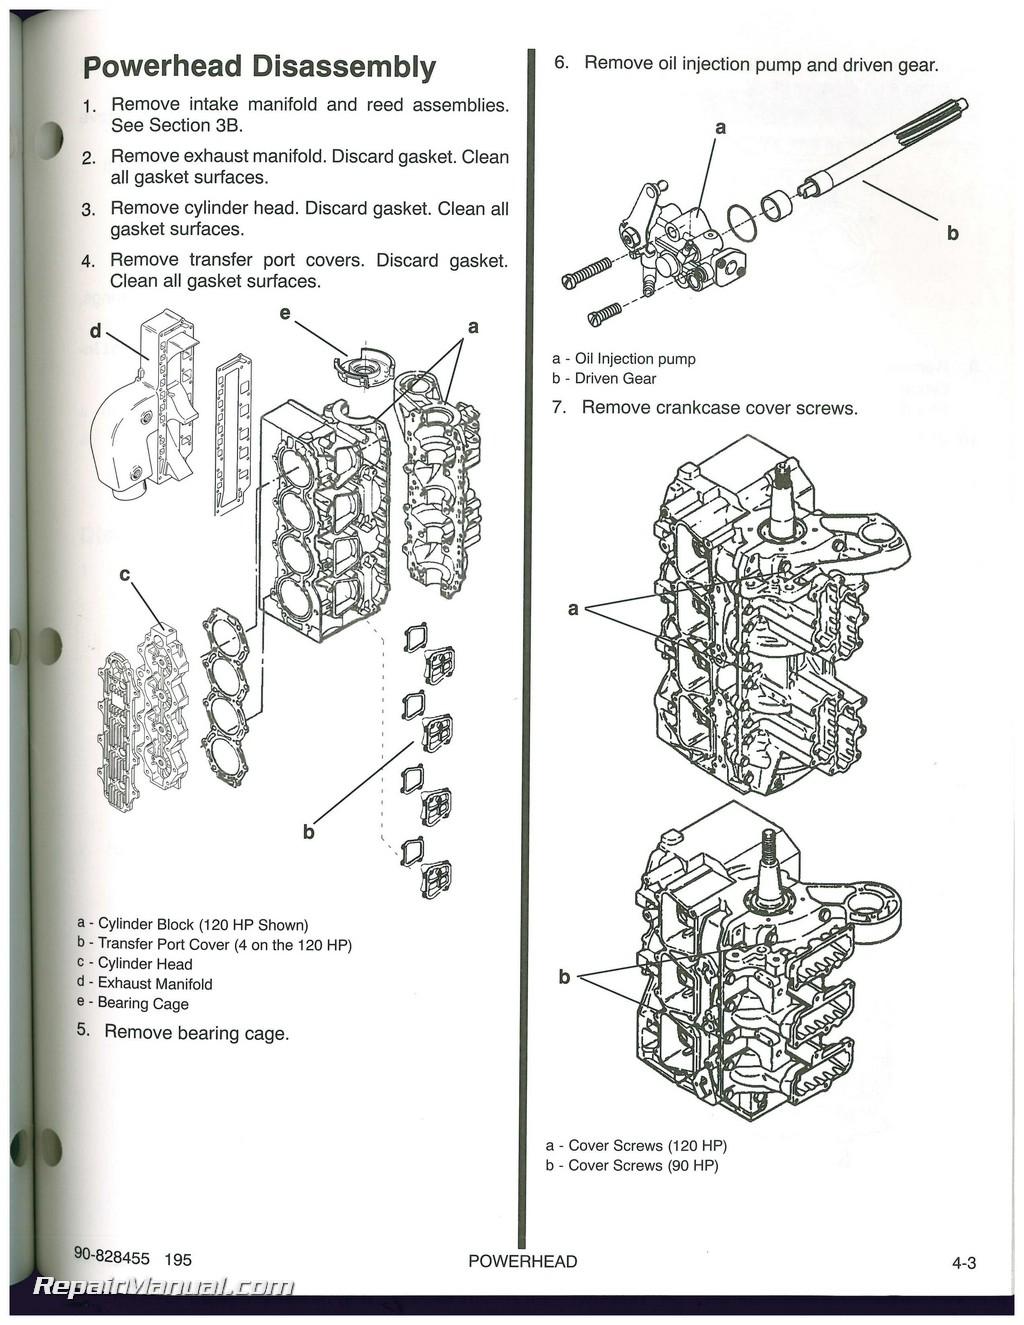 used 1995 mercury 90 120 sport jet engine service manual rh repairmanual com mercury 240 sport jet service manual mercury sport jet 120 service manual